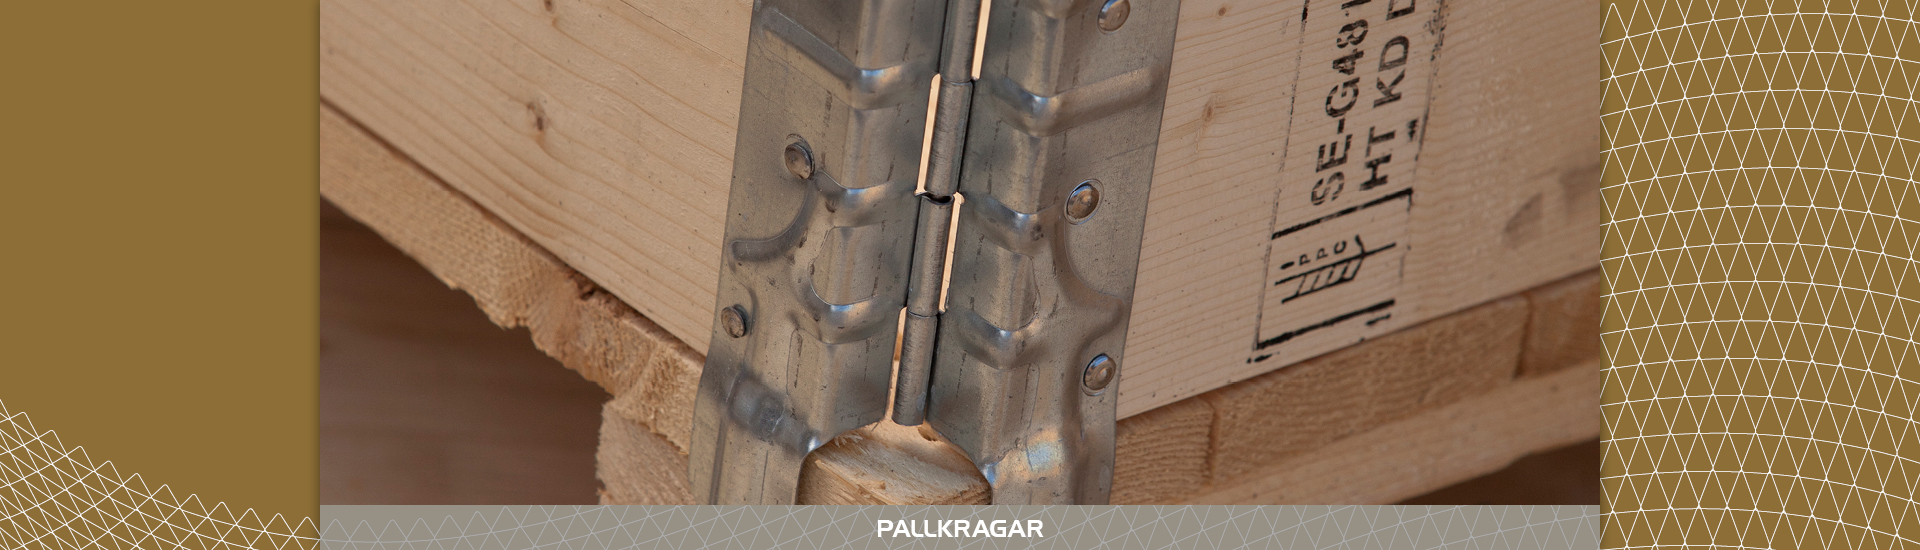 PallKragar02